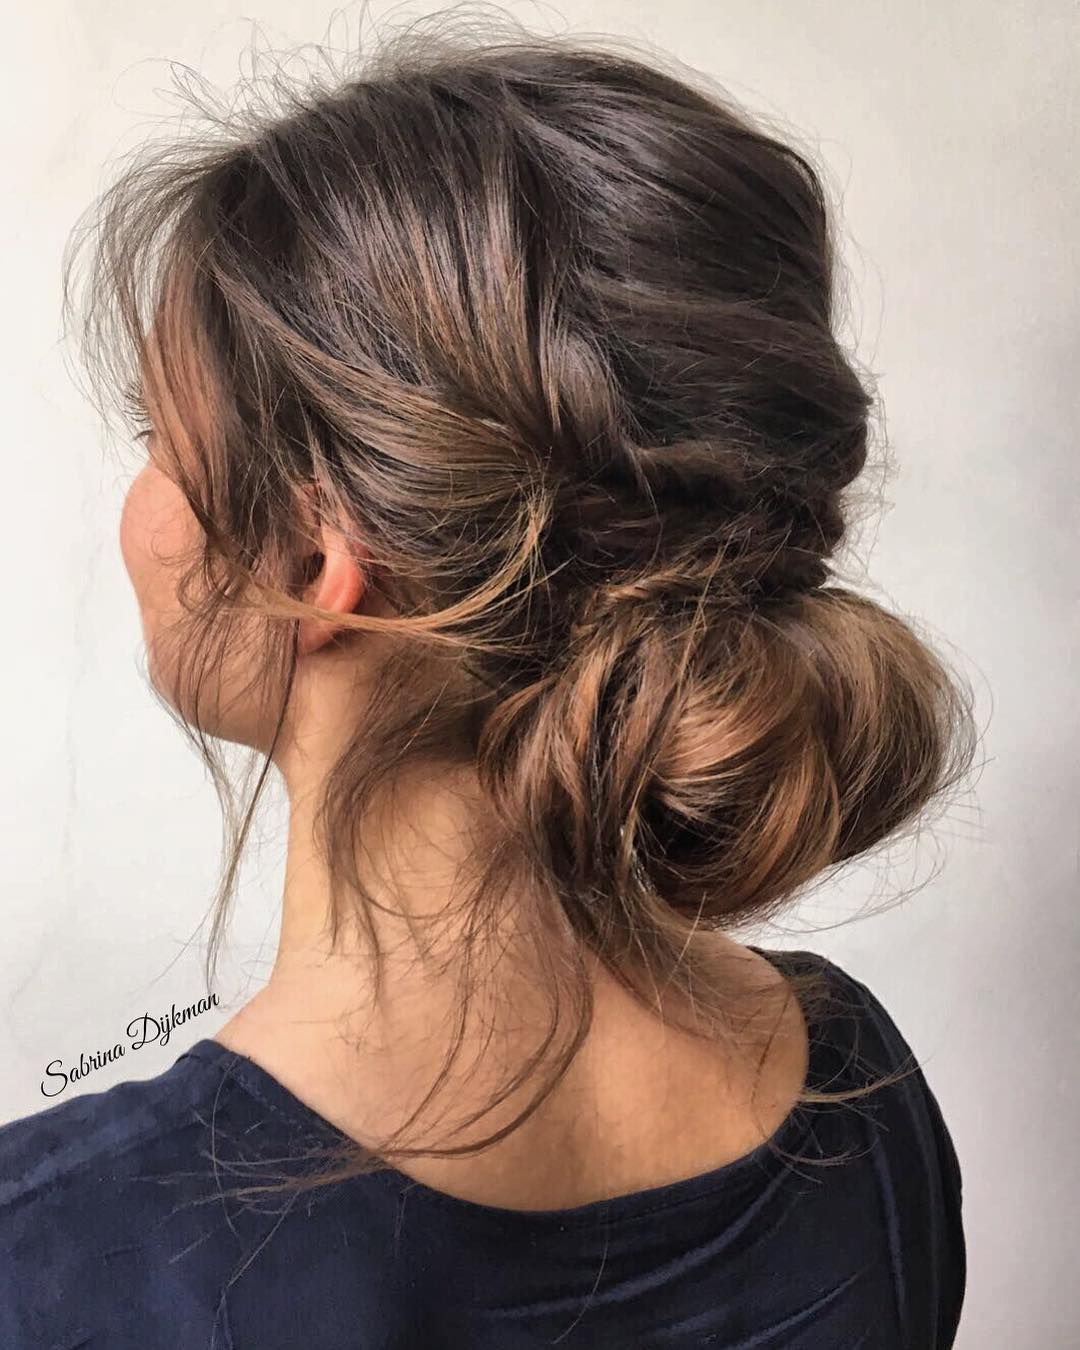 Hairstyle inspiration , updo , wedding hairstyles ,bridal updo ,upstyle #updo #weddinghair braids